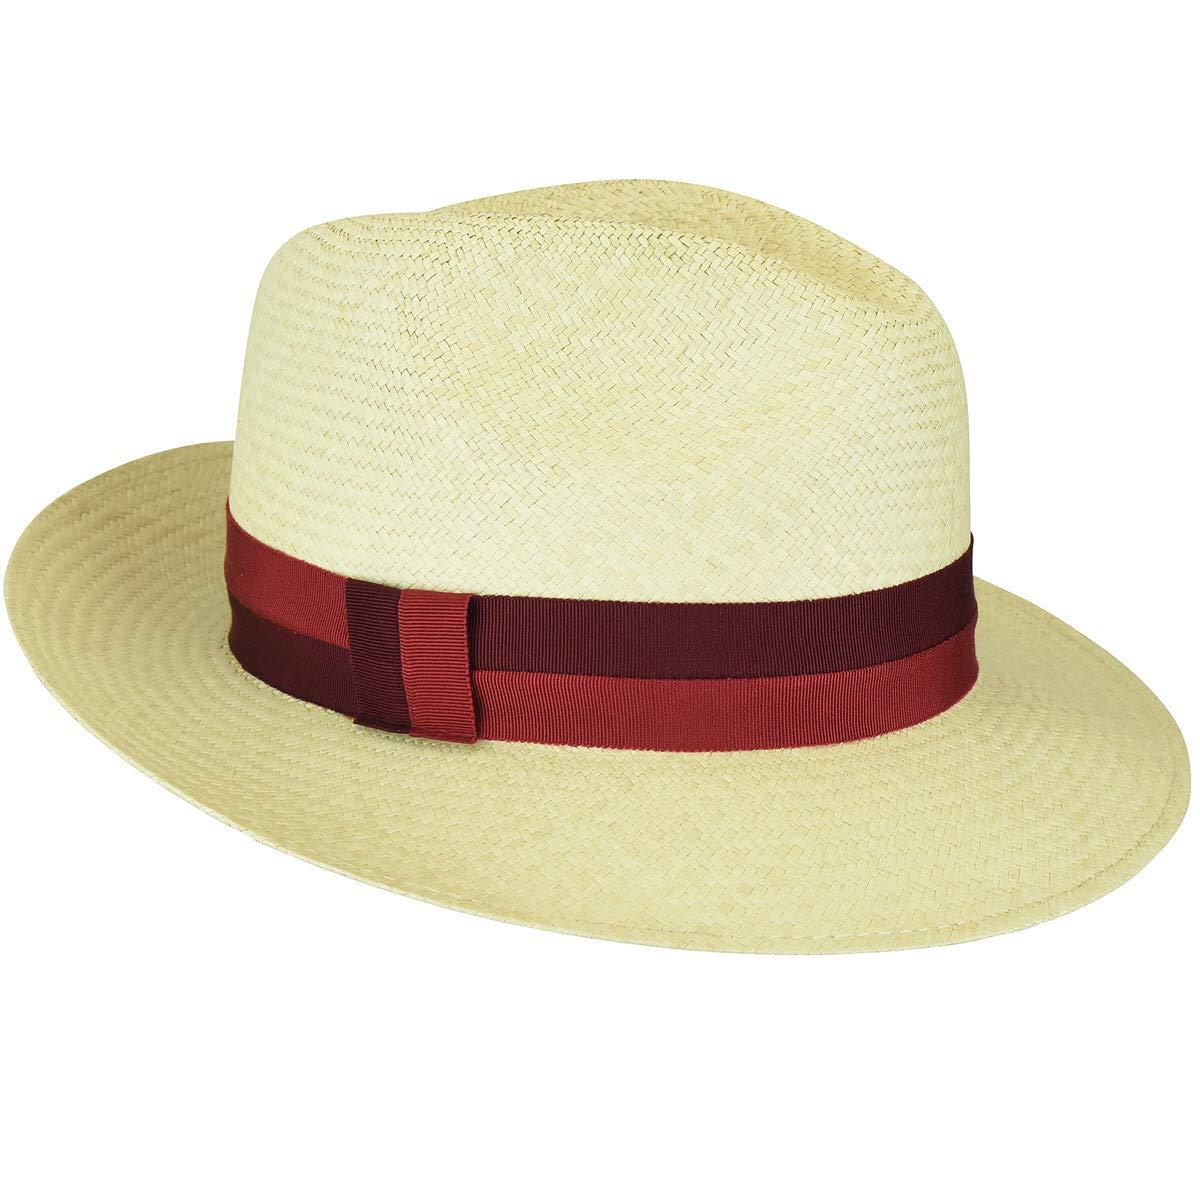 Bailey of Hollywood Men Halpern Panama Fedora Natural-Red L